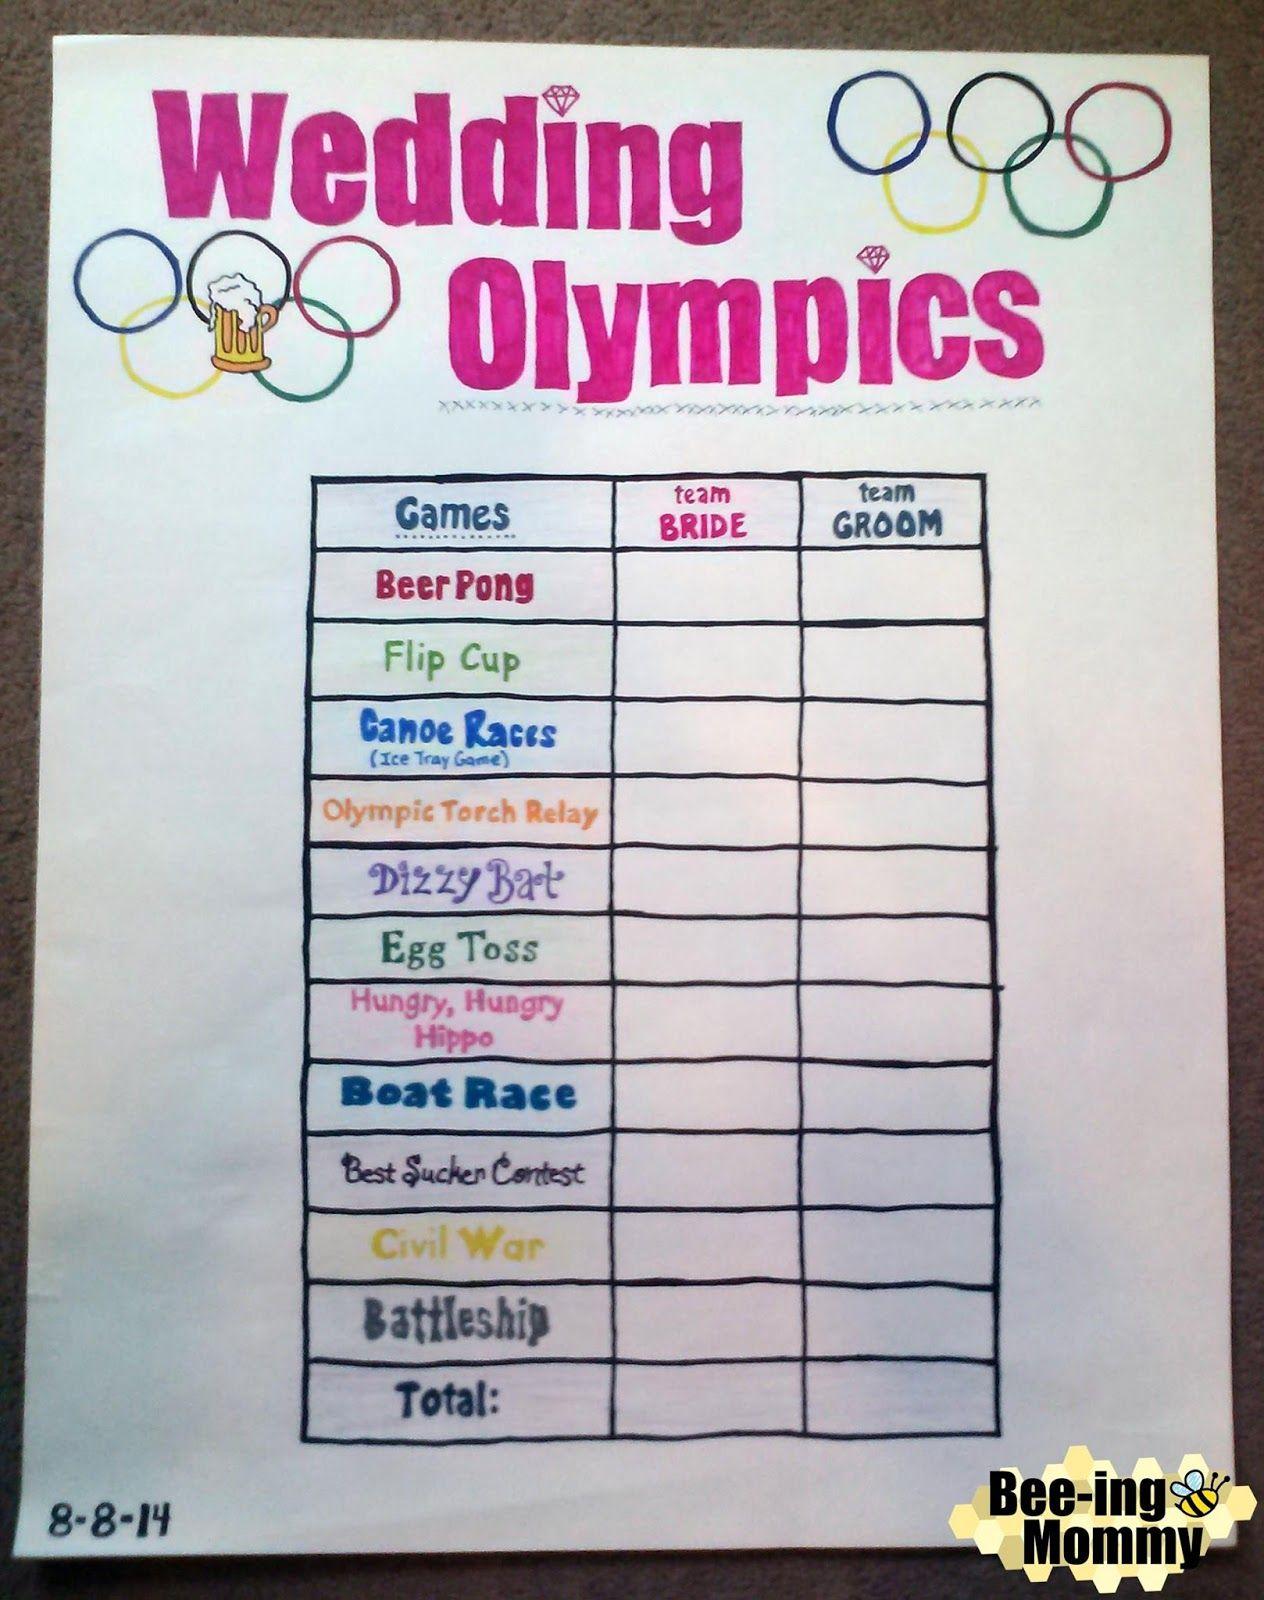 Wedding Olympics aka Beer Olympics Beer olympics party